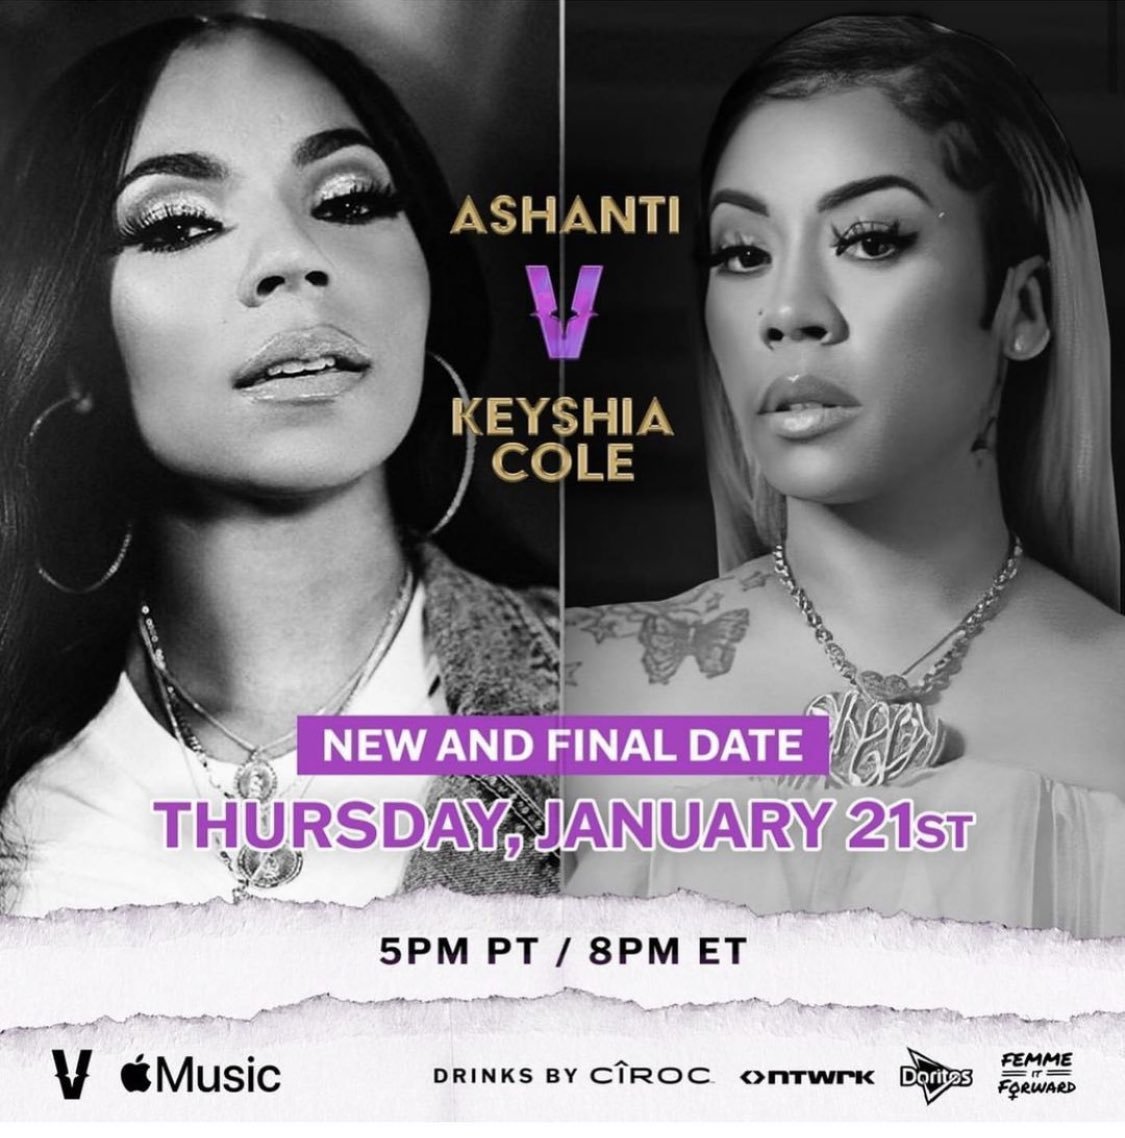 It's finally happening! #Verzuz #Ashanti #keyshiacole Thursday!